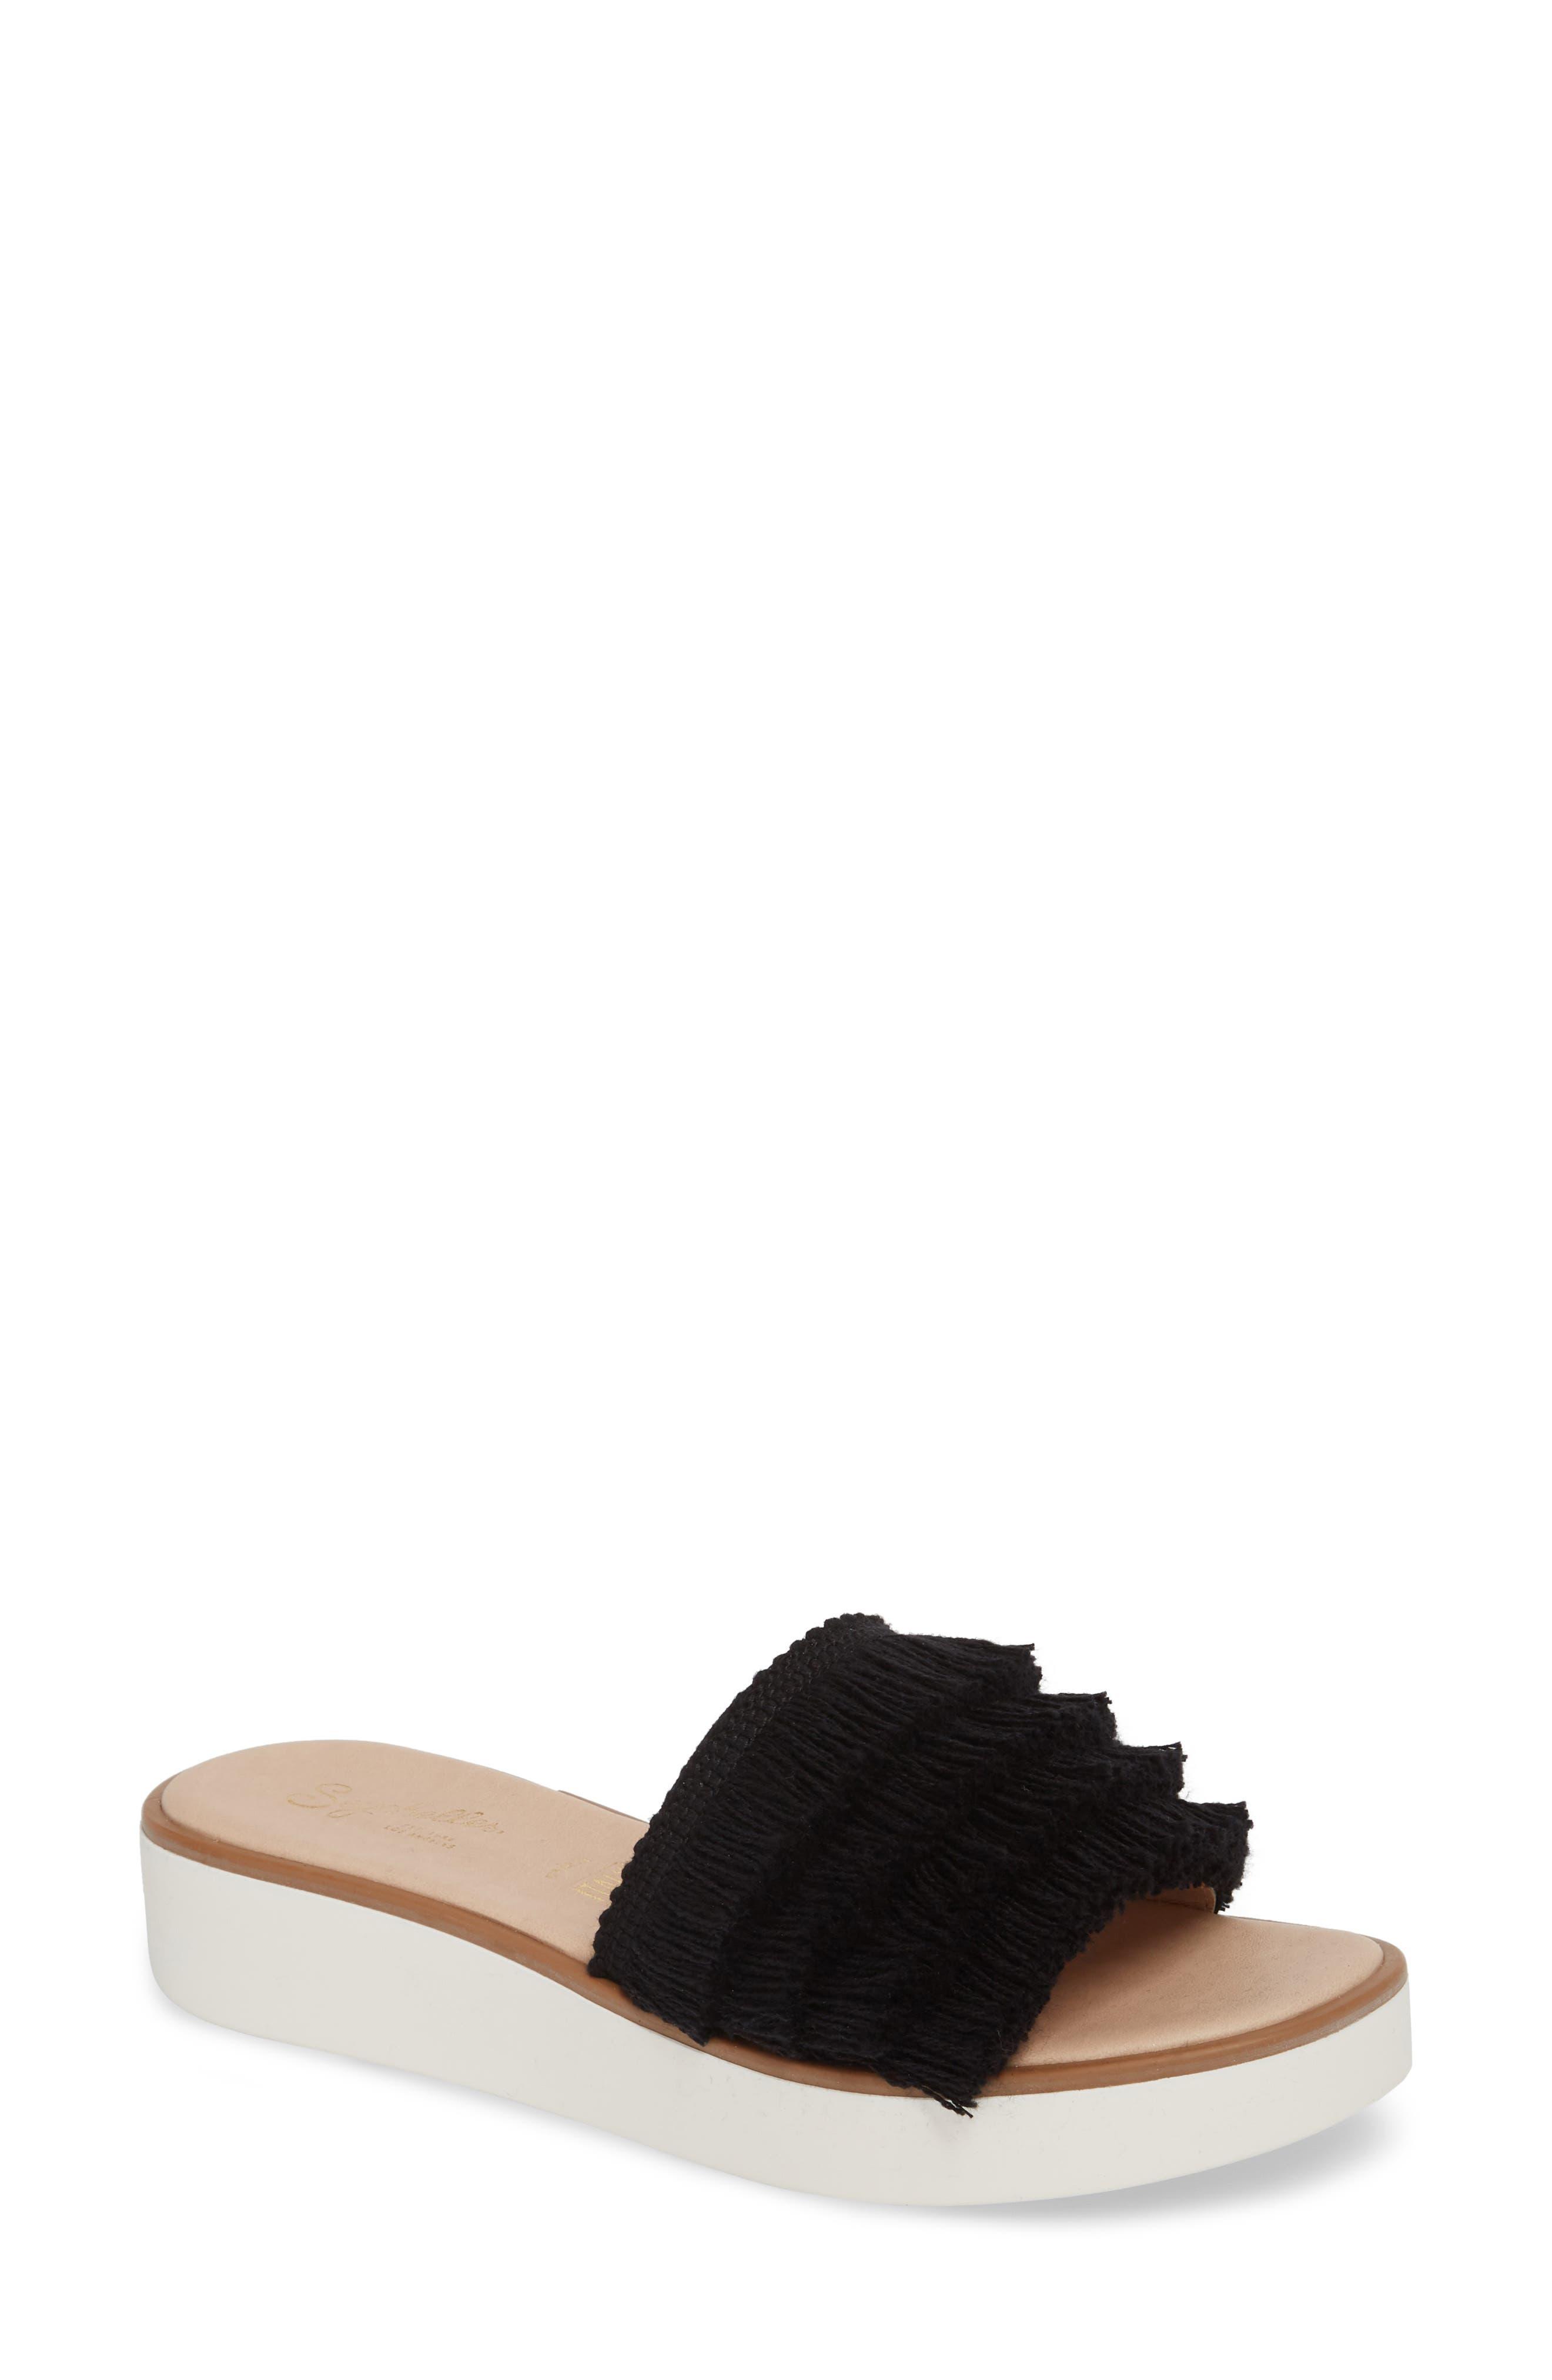 Well Rested Ruffle Slide Sandal,                         Main,                         color, 001